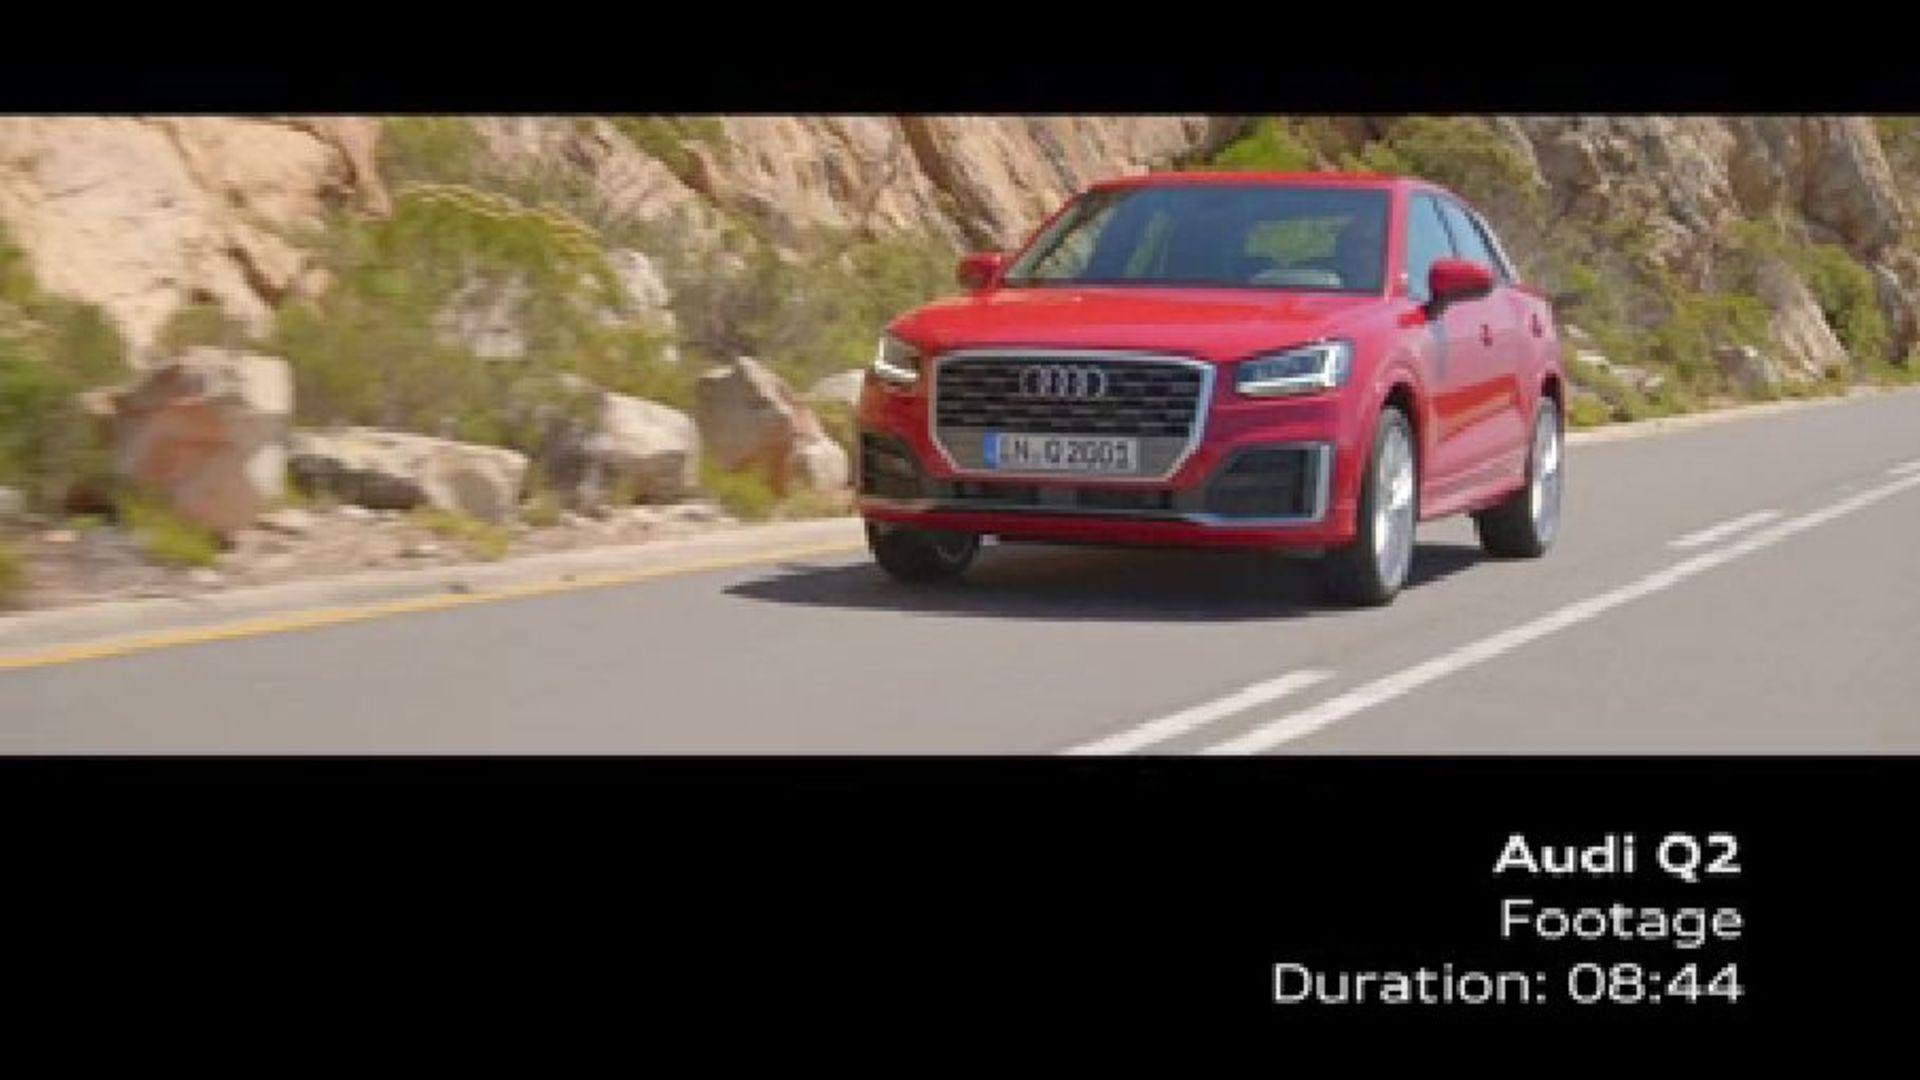 Audi Q2 - Footage Tango Red